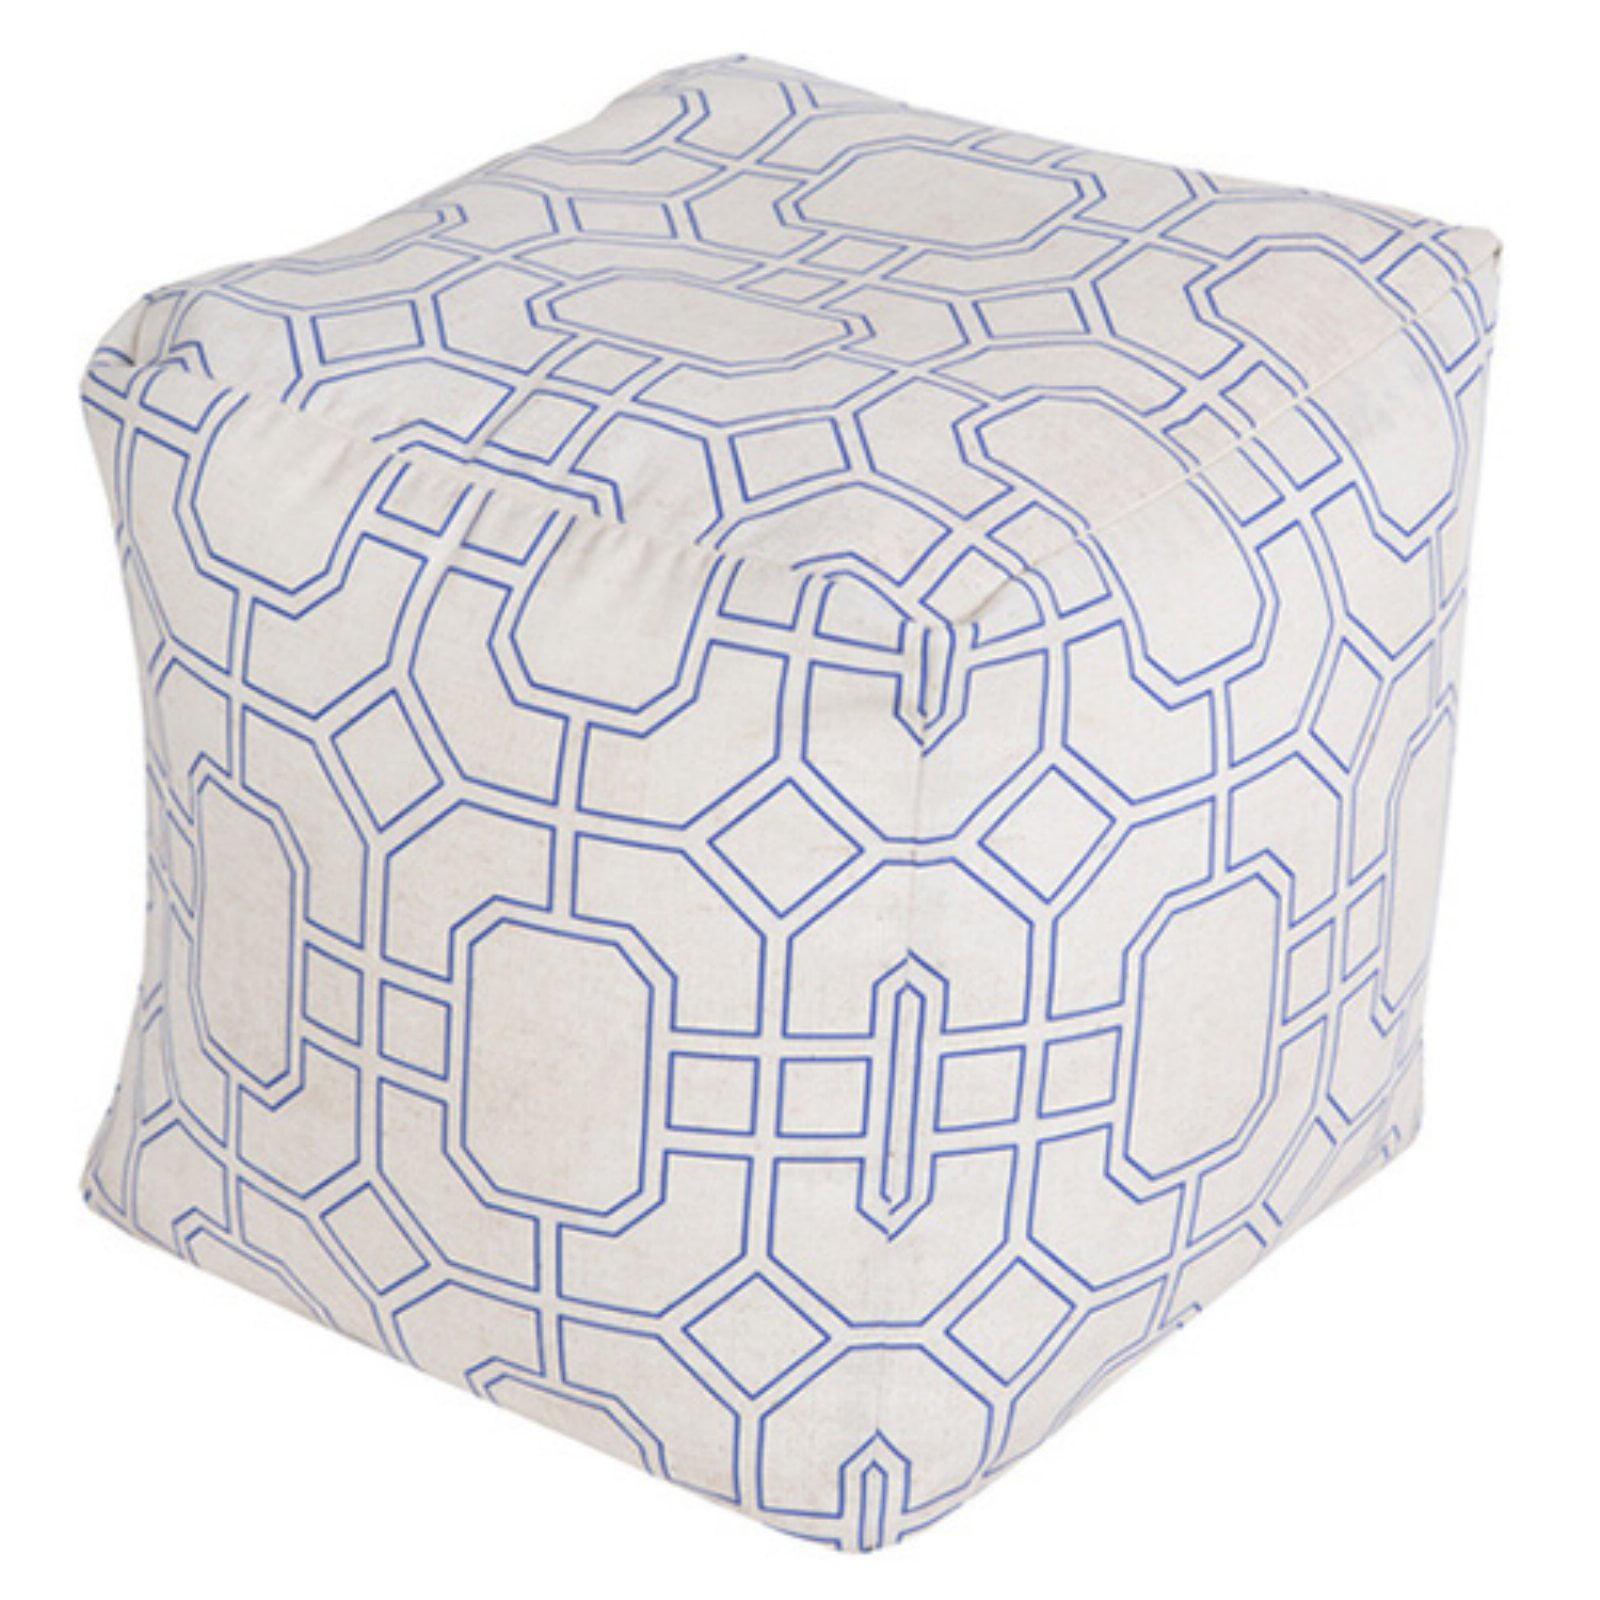 Surya 20 x 20 in. Geometric Iris Cube Pouf by Surya